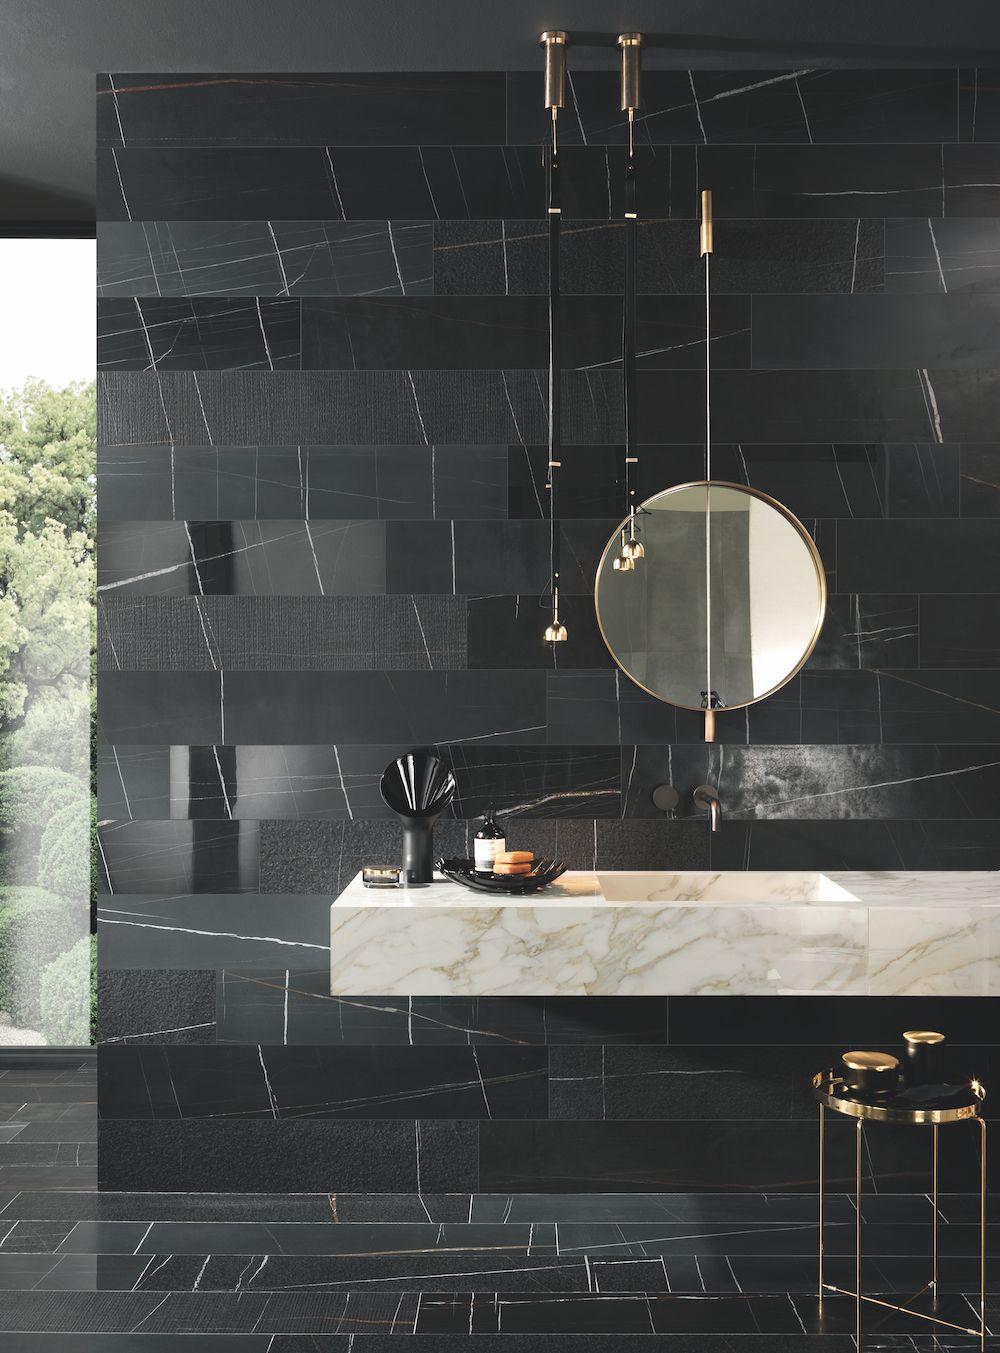 Tendance Deco Chic Intemporel In 2020 Bathroom Design Round